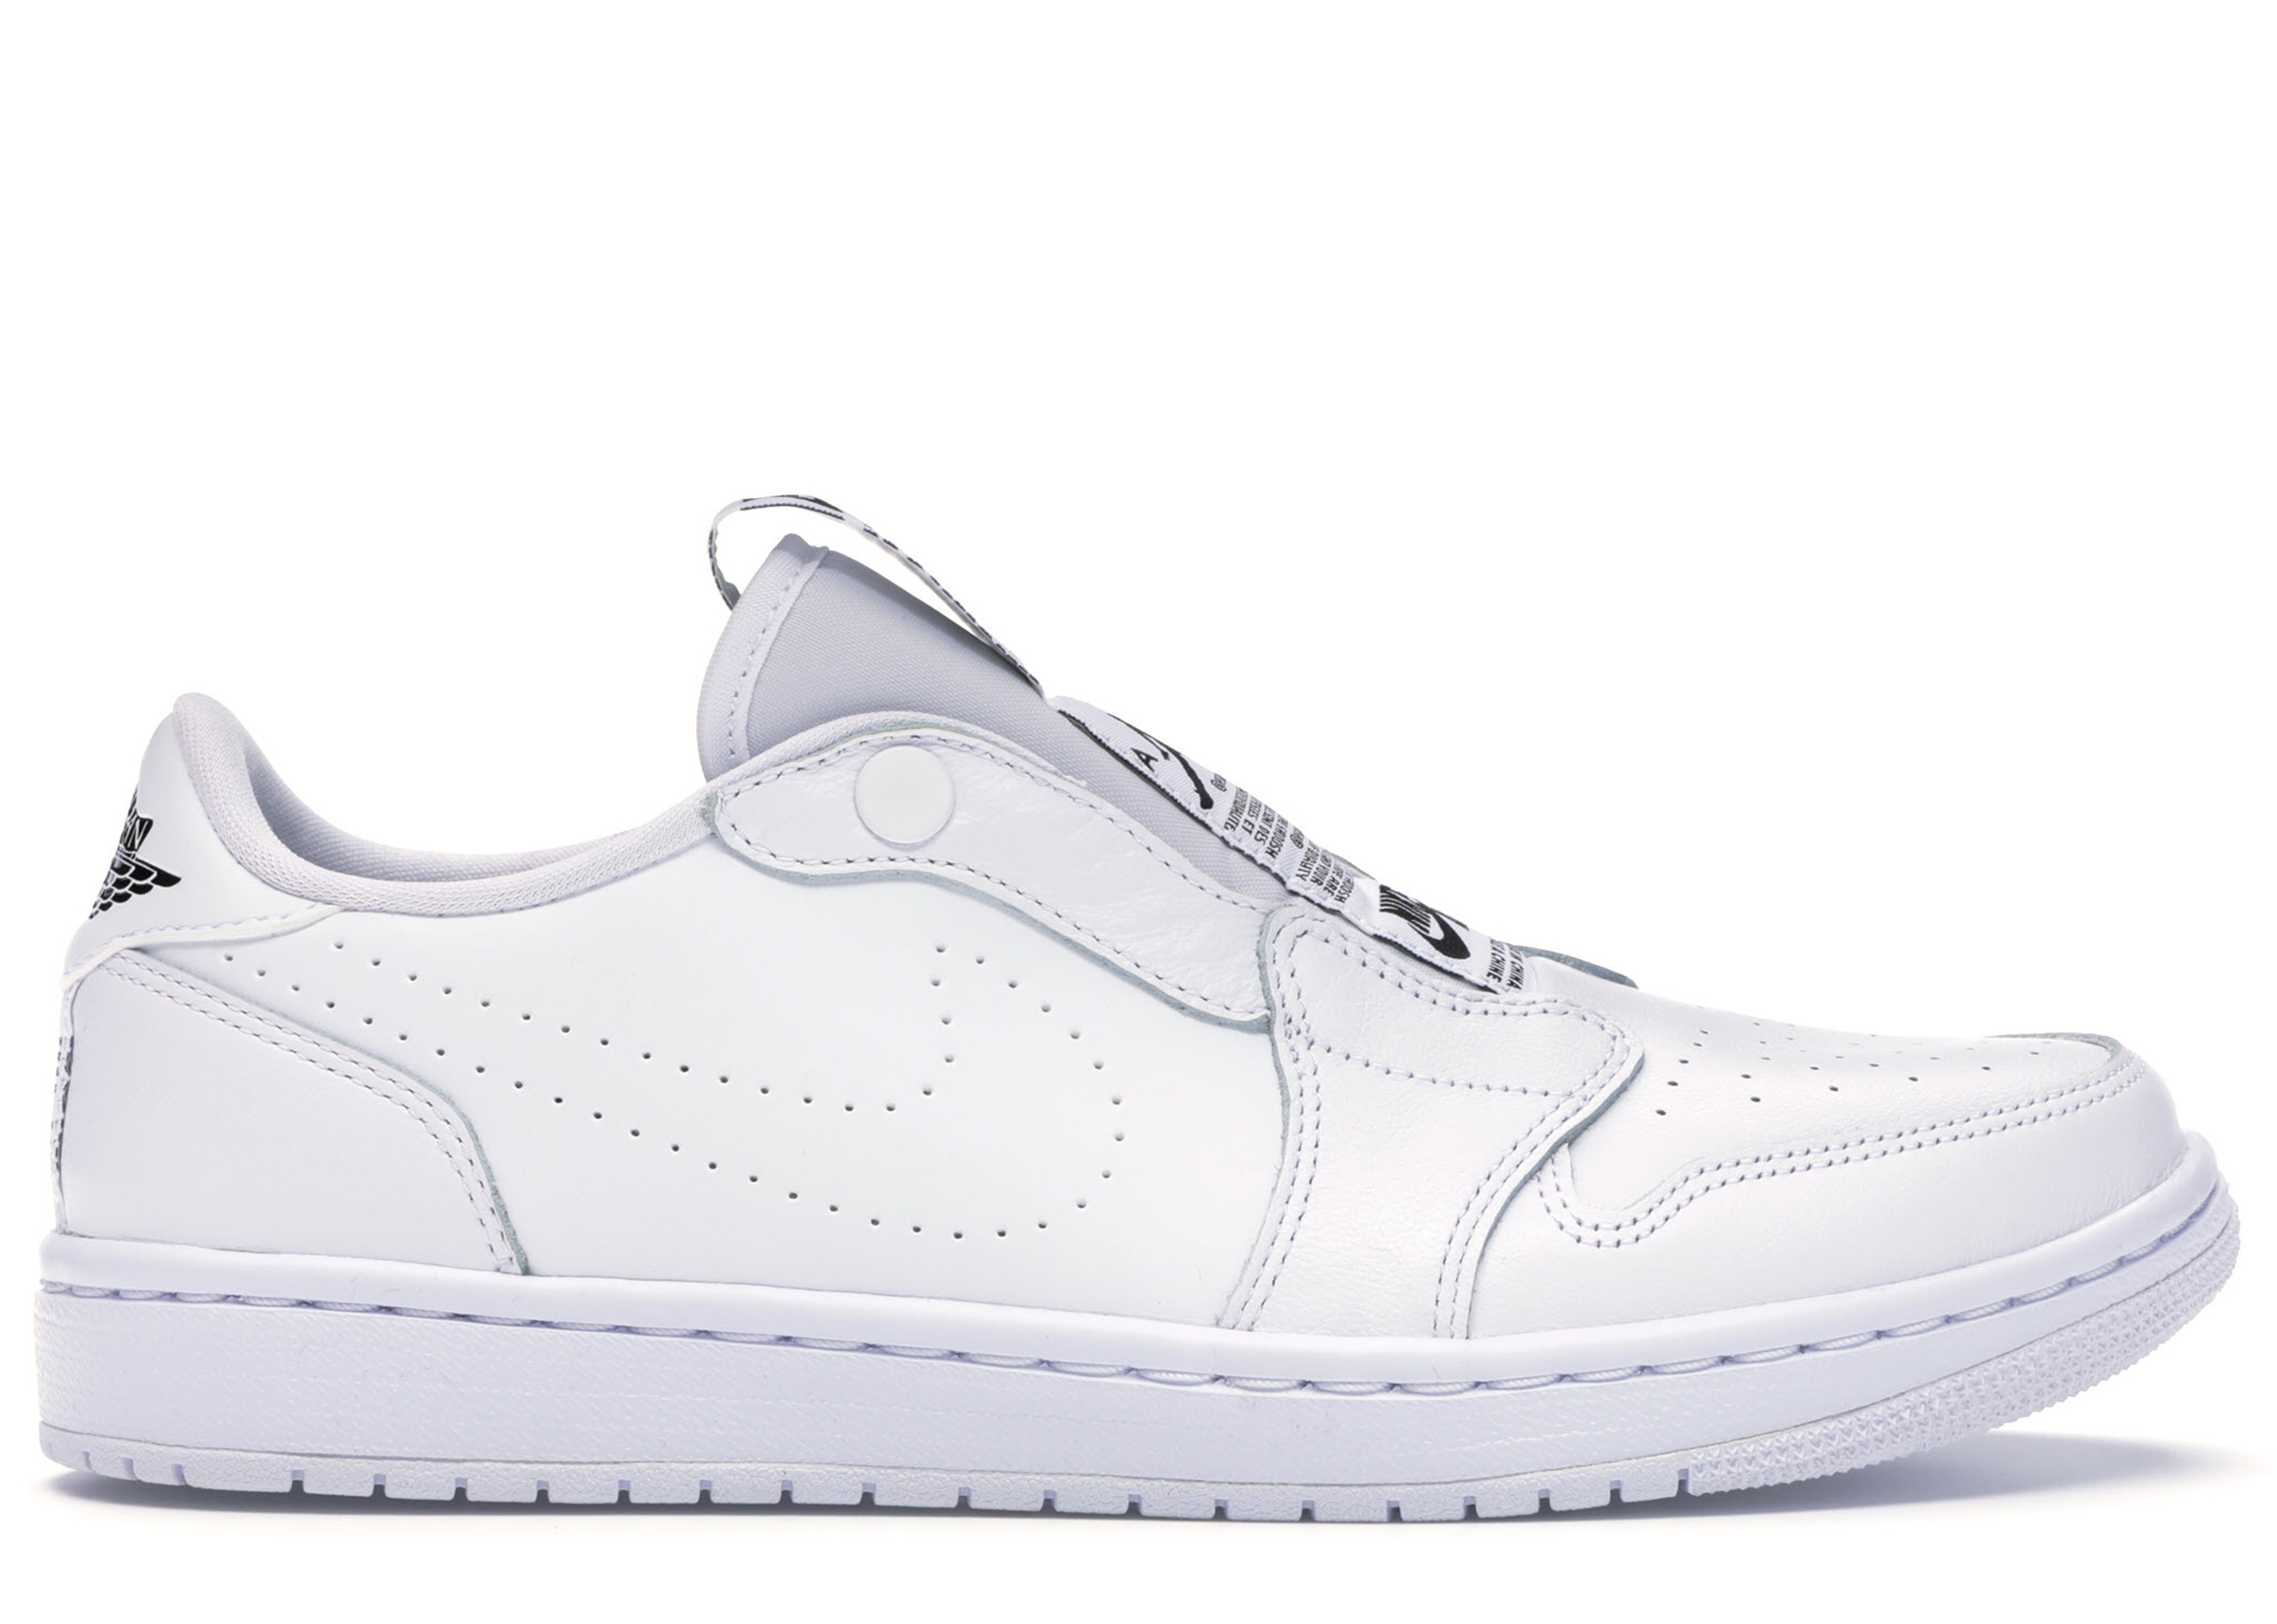 Jordan 1 Retro Low Slip White (W